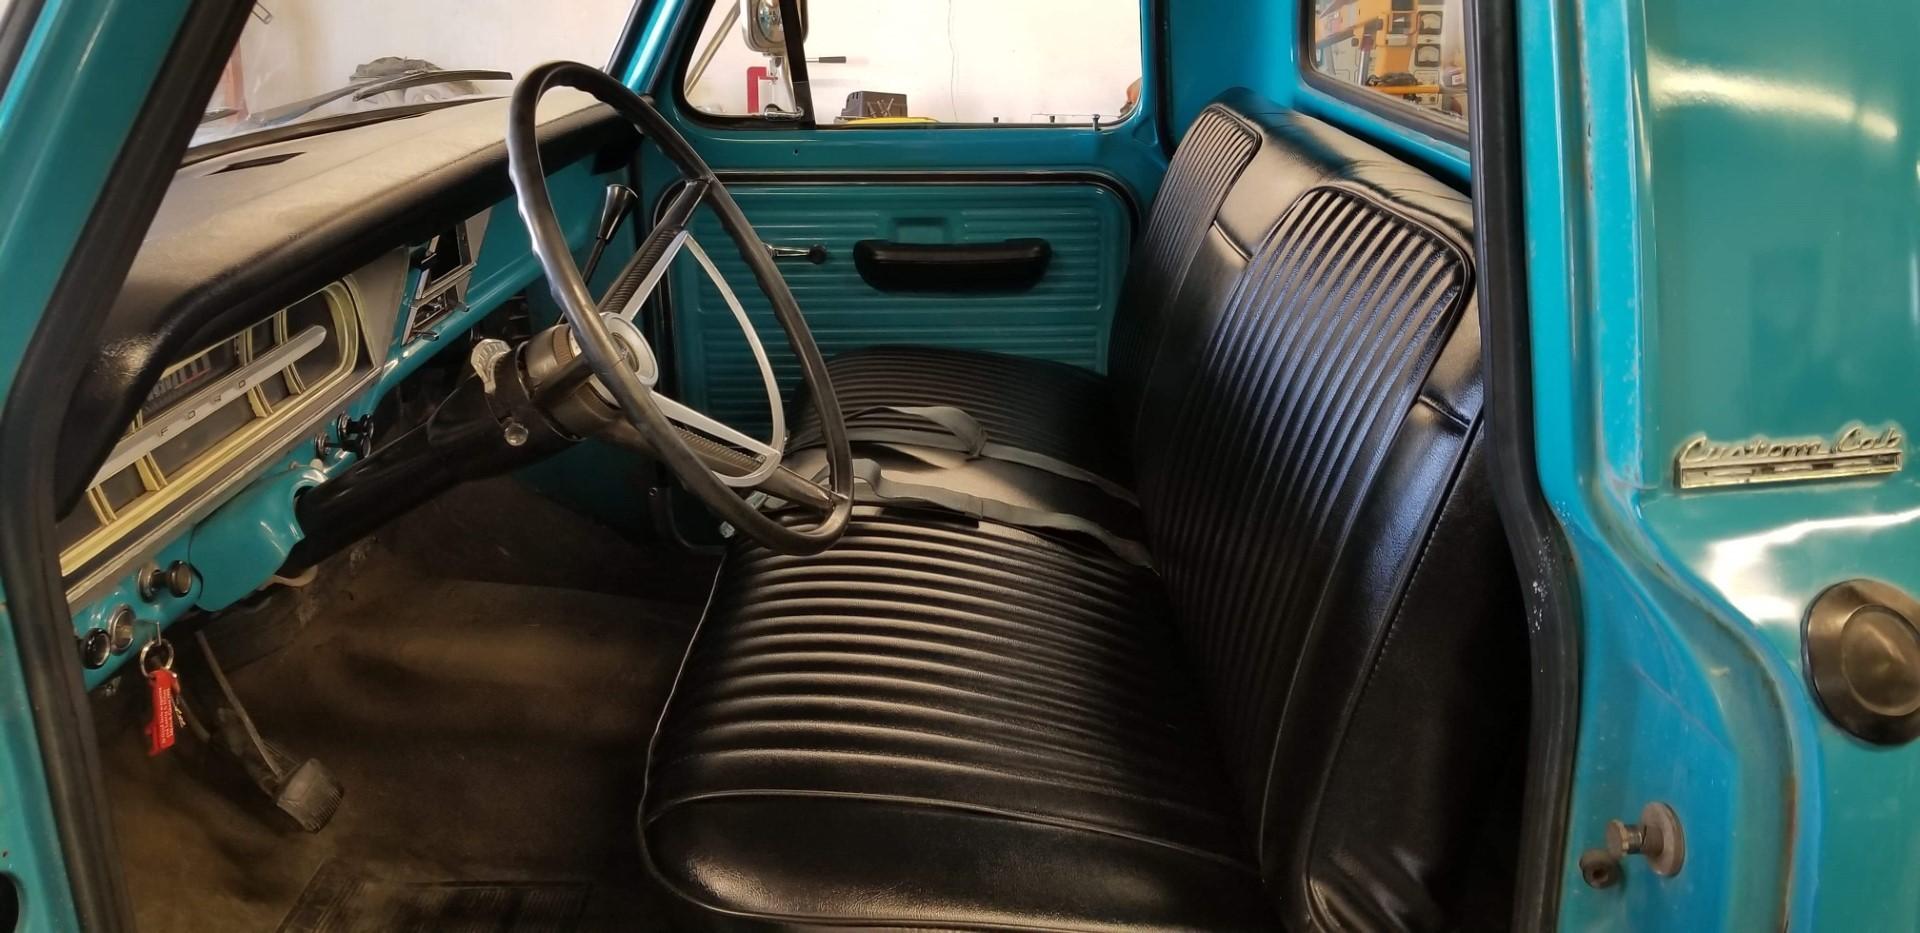 1969-Ford-F250-Custom-Cab-Camper-Special-360ci-V8-13